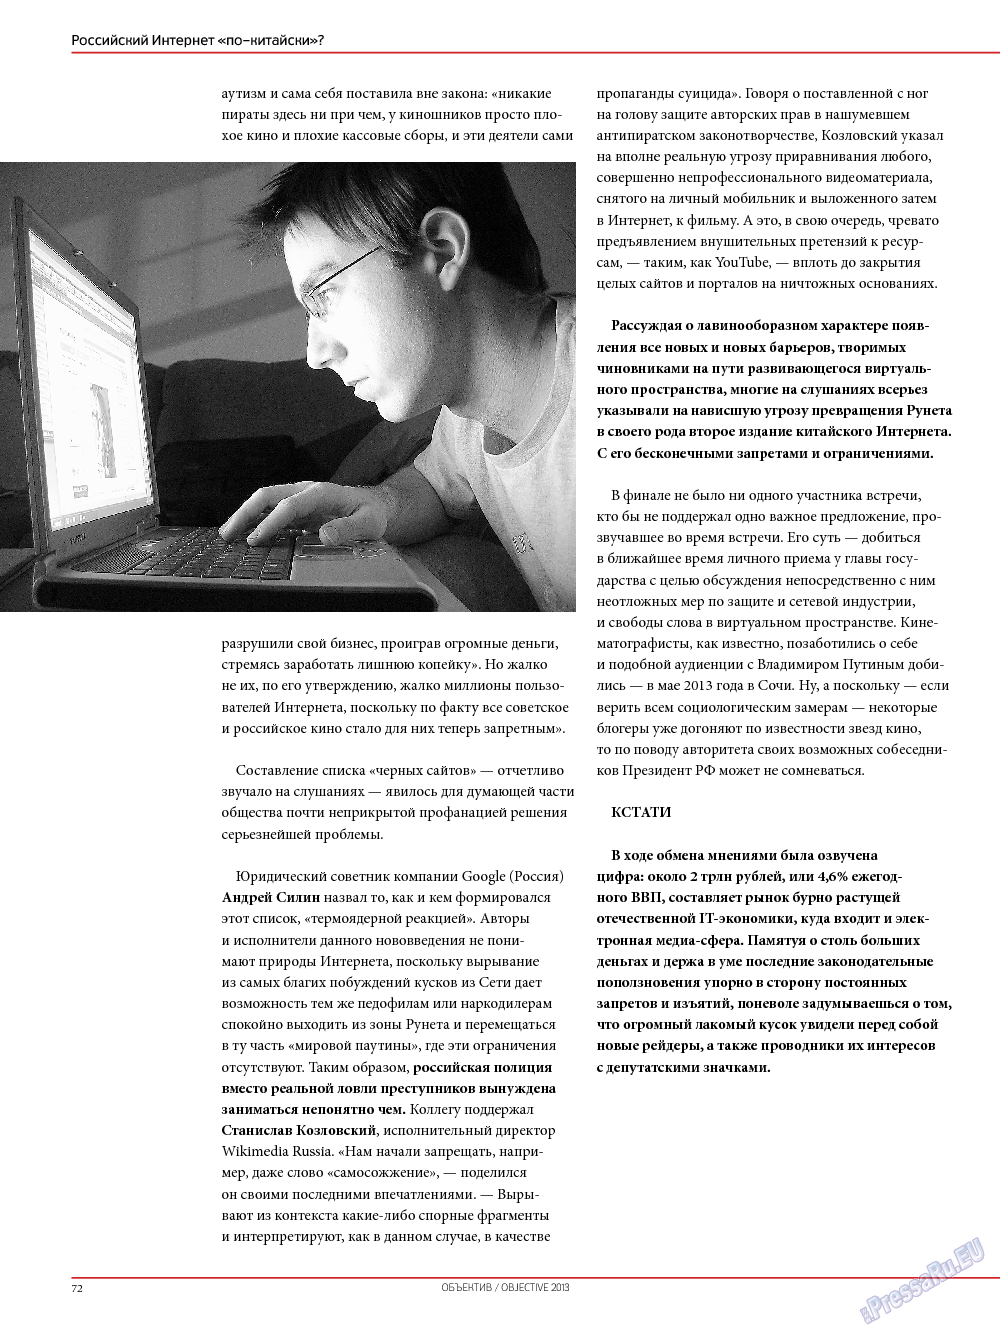 Объектив EU (журнал). 2013 год, номер 2, стр. 74